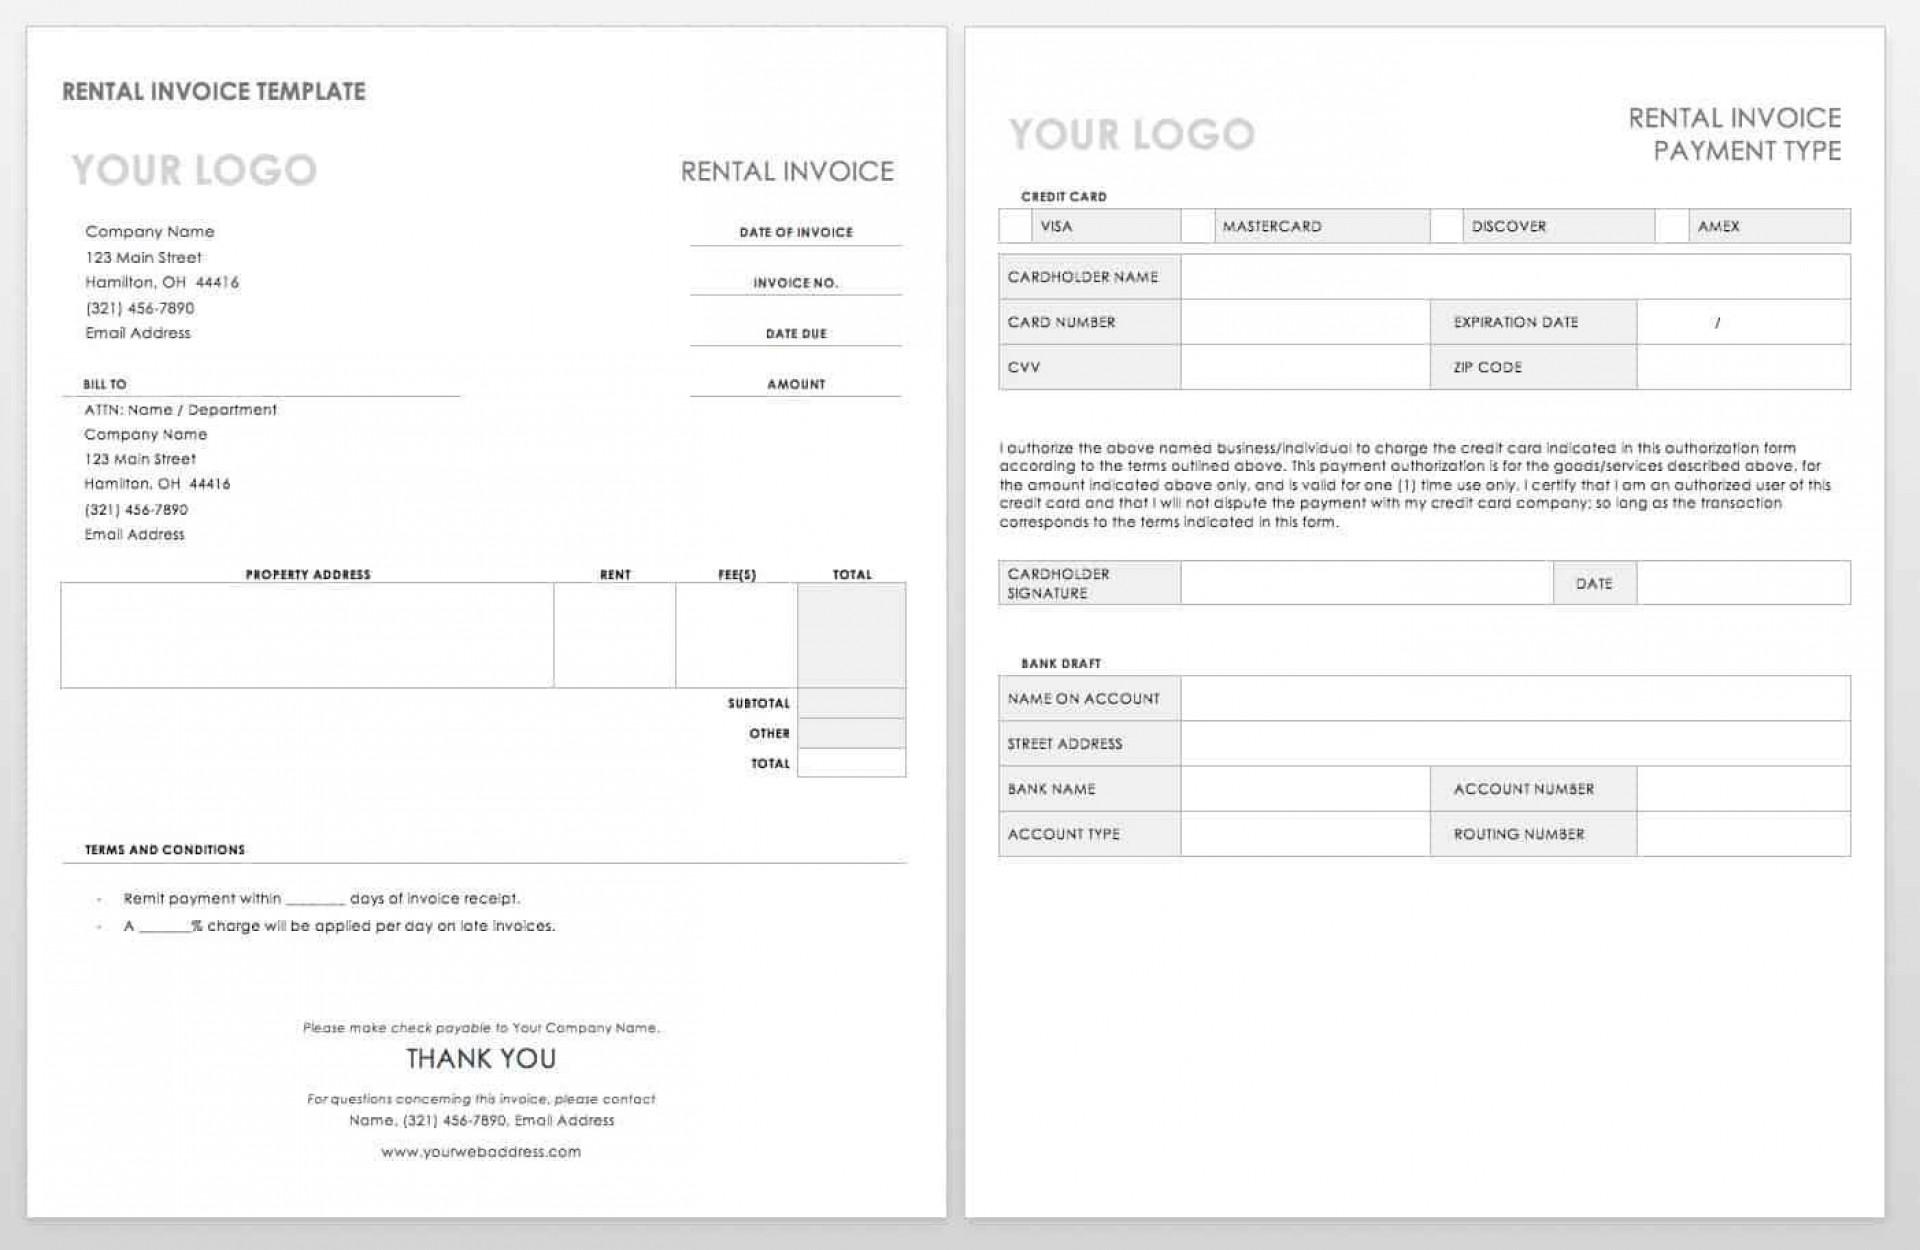 004 Surprising Professional Invoice Template Word Photo  Service Microsoft1920